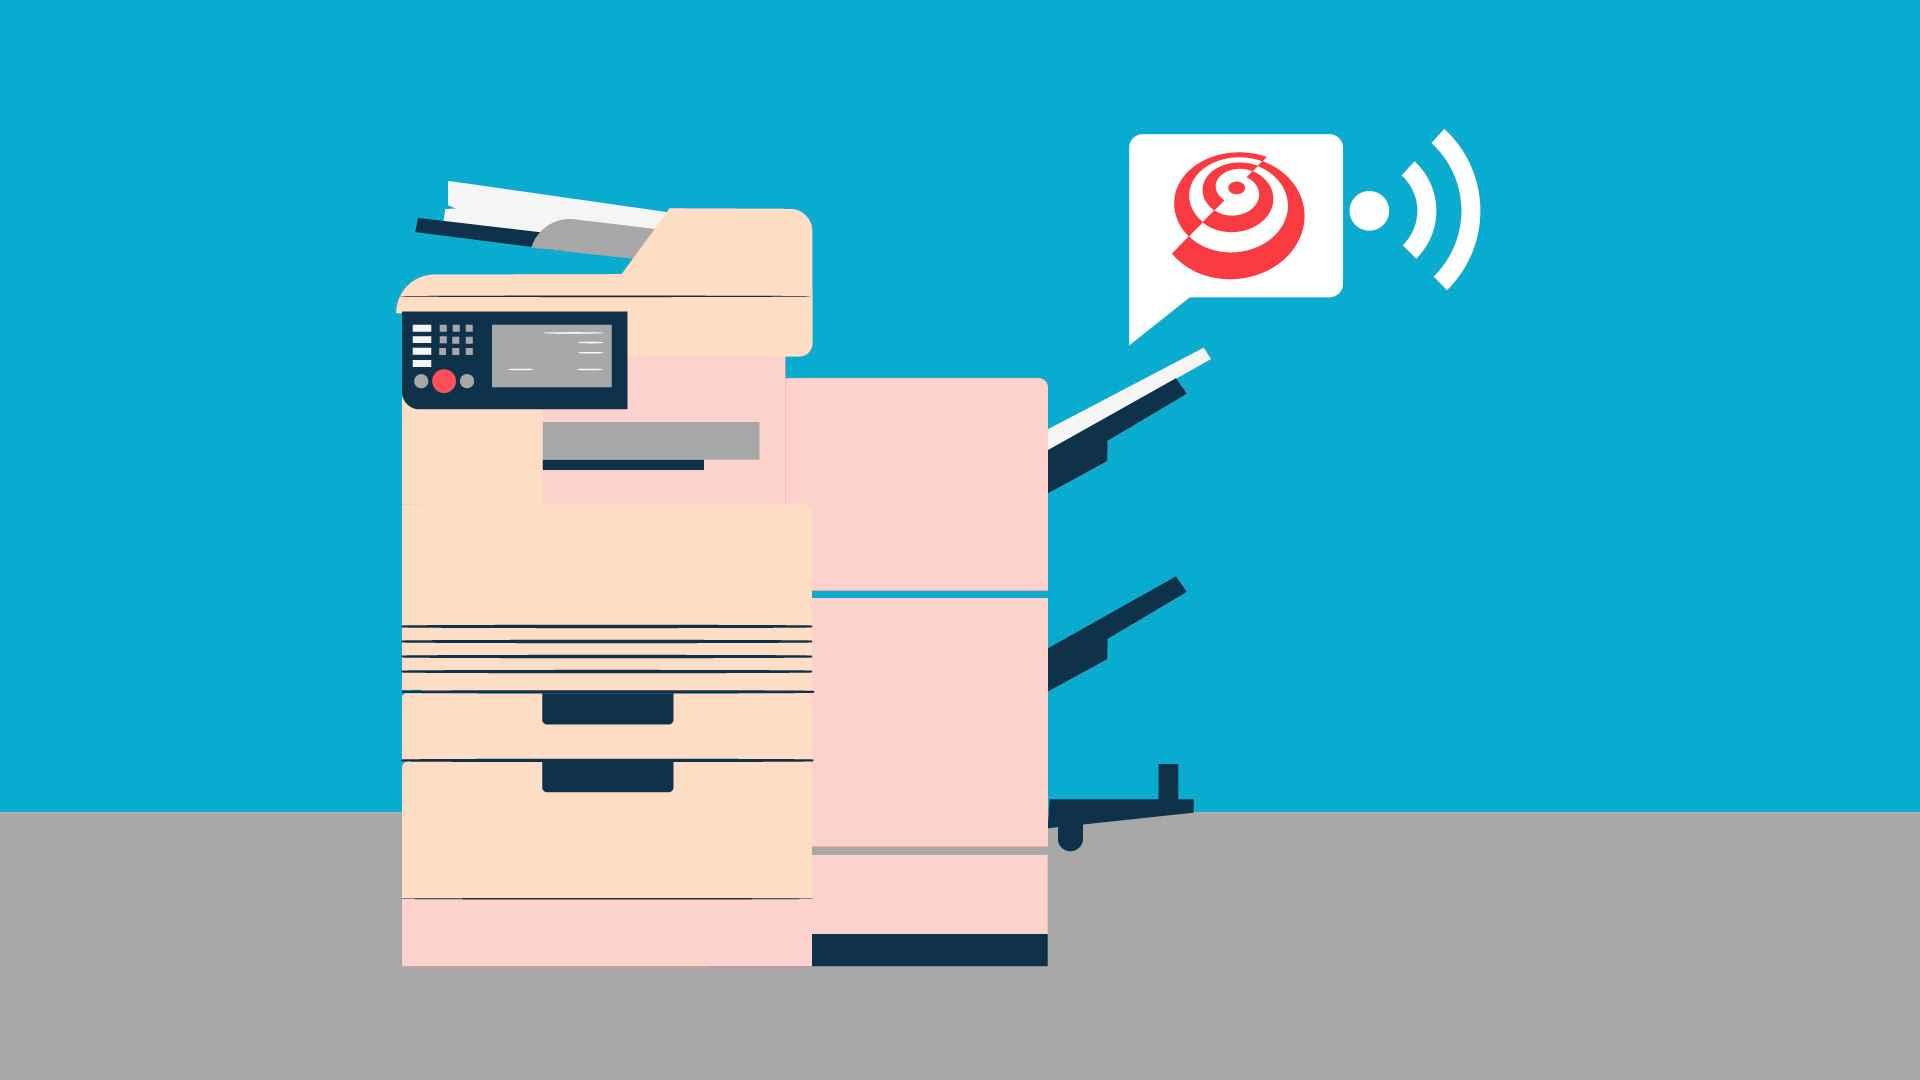 Equipment Breakdown in Animated Marketing Video